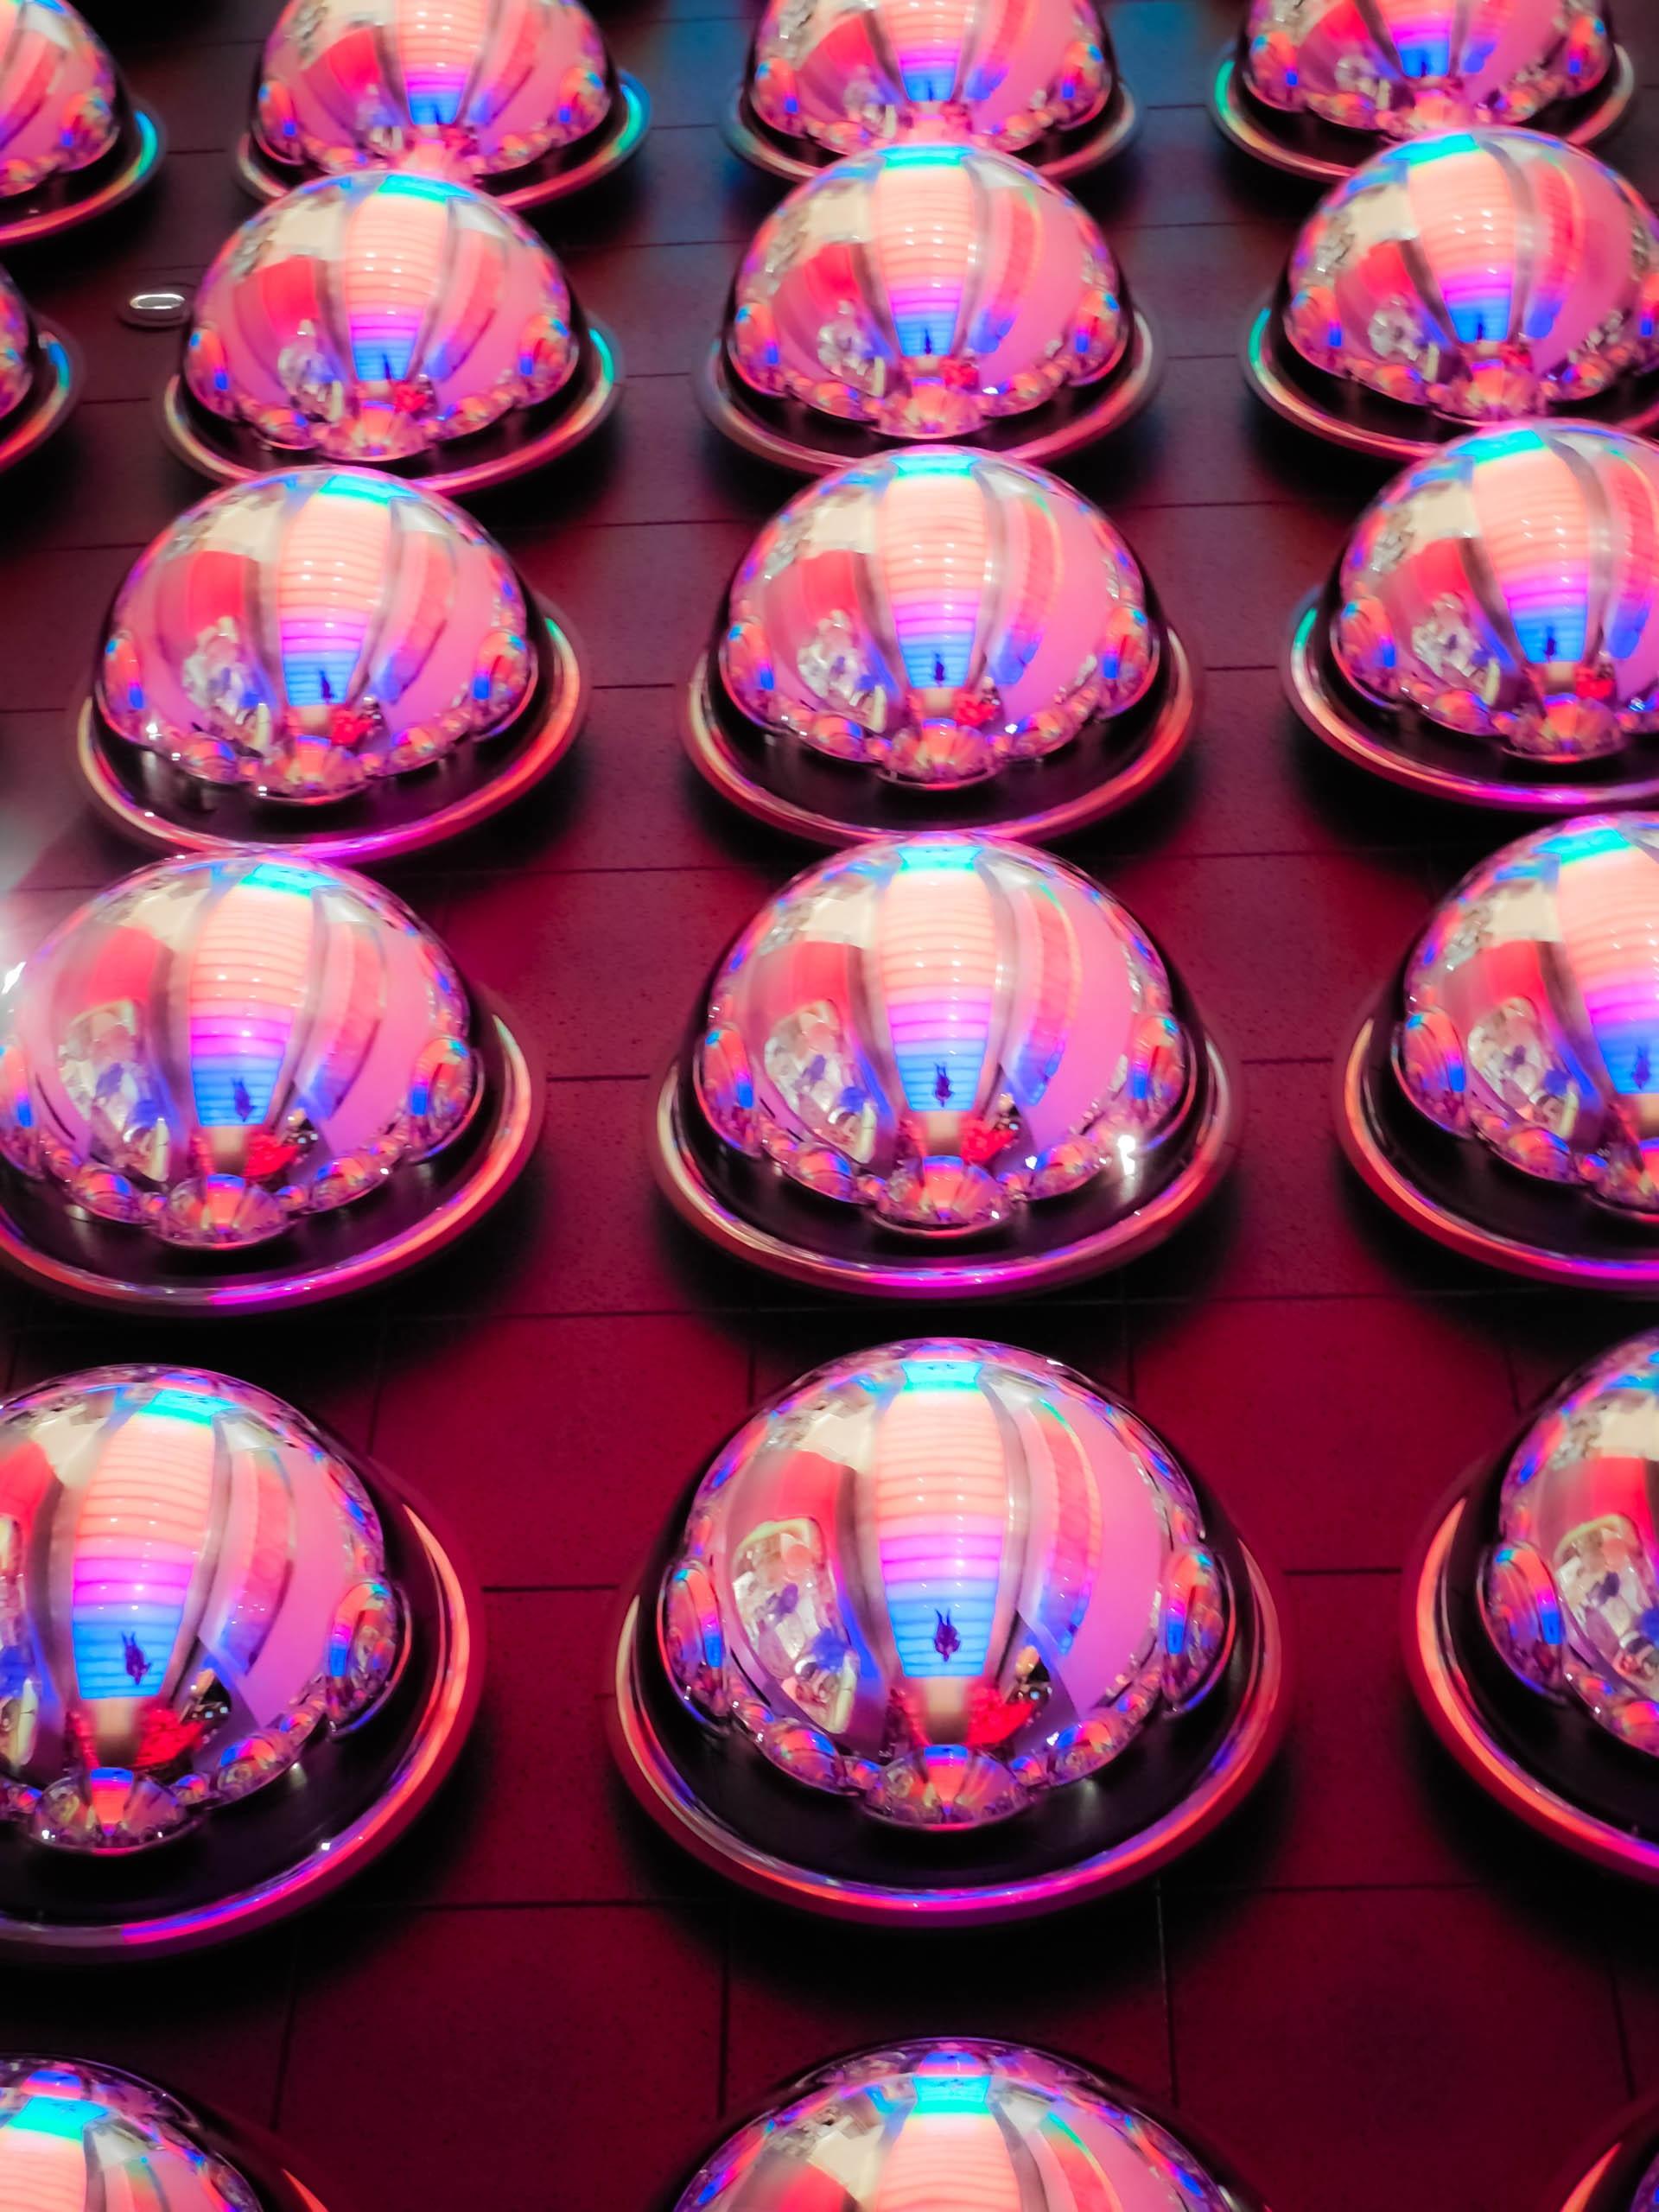 textura decoracin patrn comida rojo color vistoso rosado magdalena postre iluminacin pastel pastel de cumpleaos luces